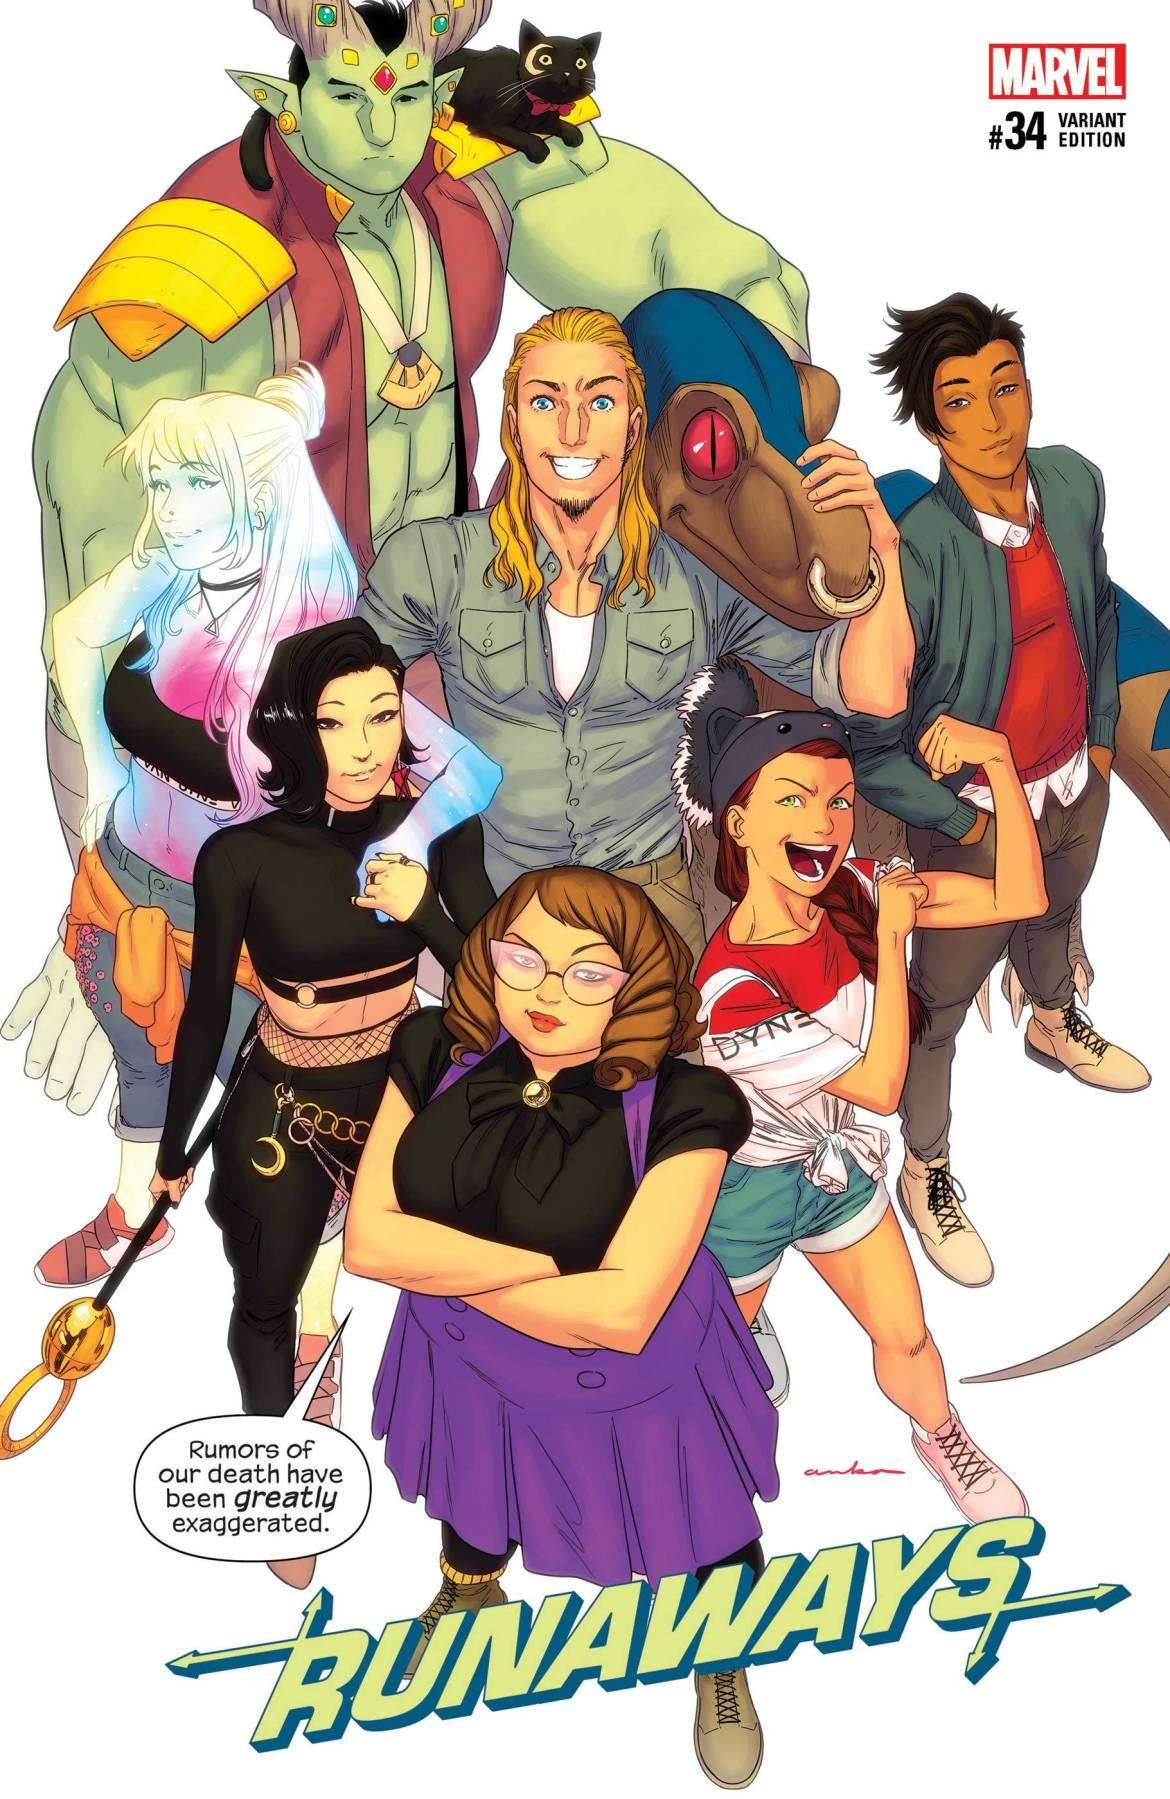 STL180911 ComicList: Marvel Comics New Releases for 03/03/2021